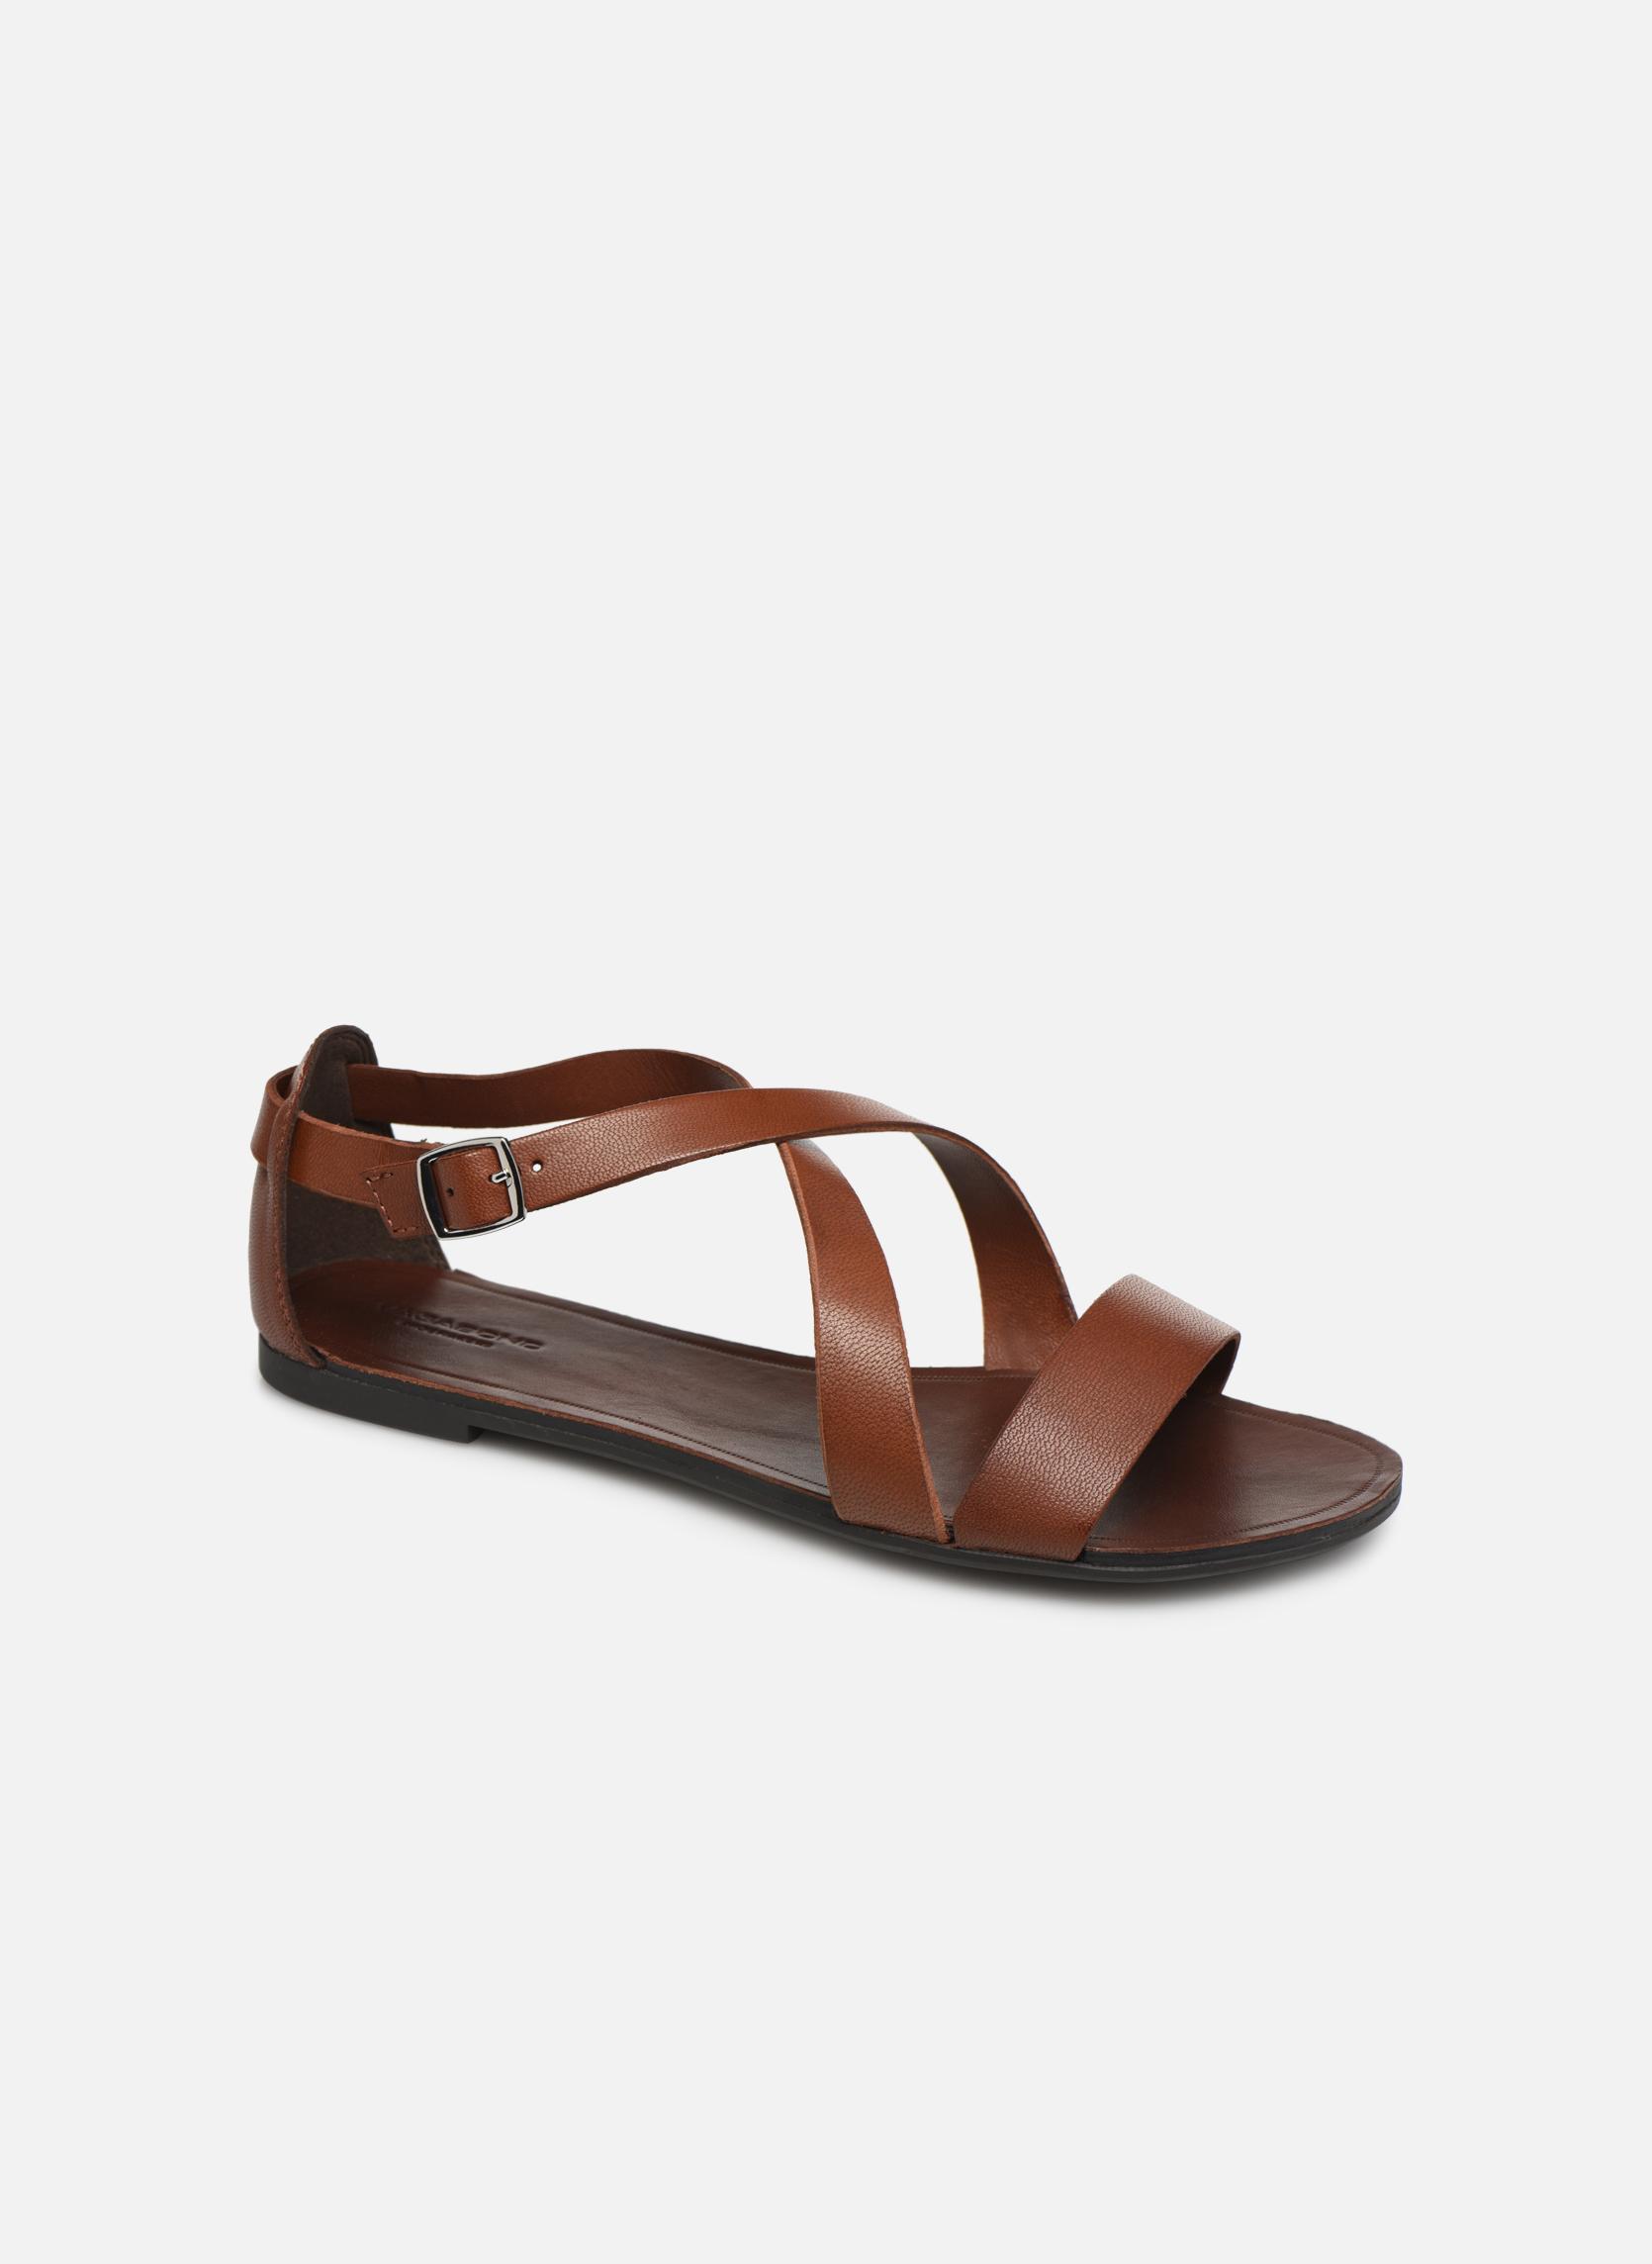 Tia 4531-001 par Vagabond Shoemakers